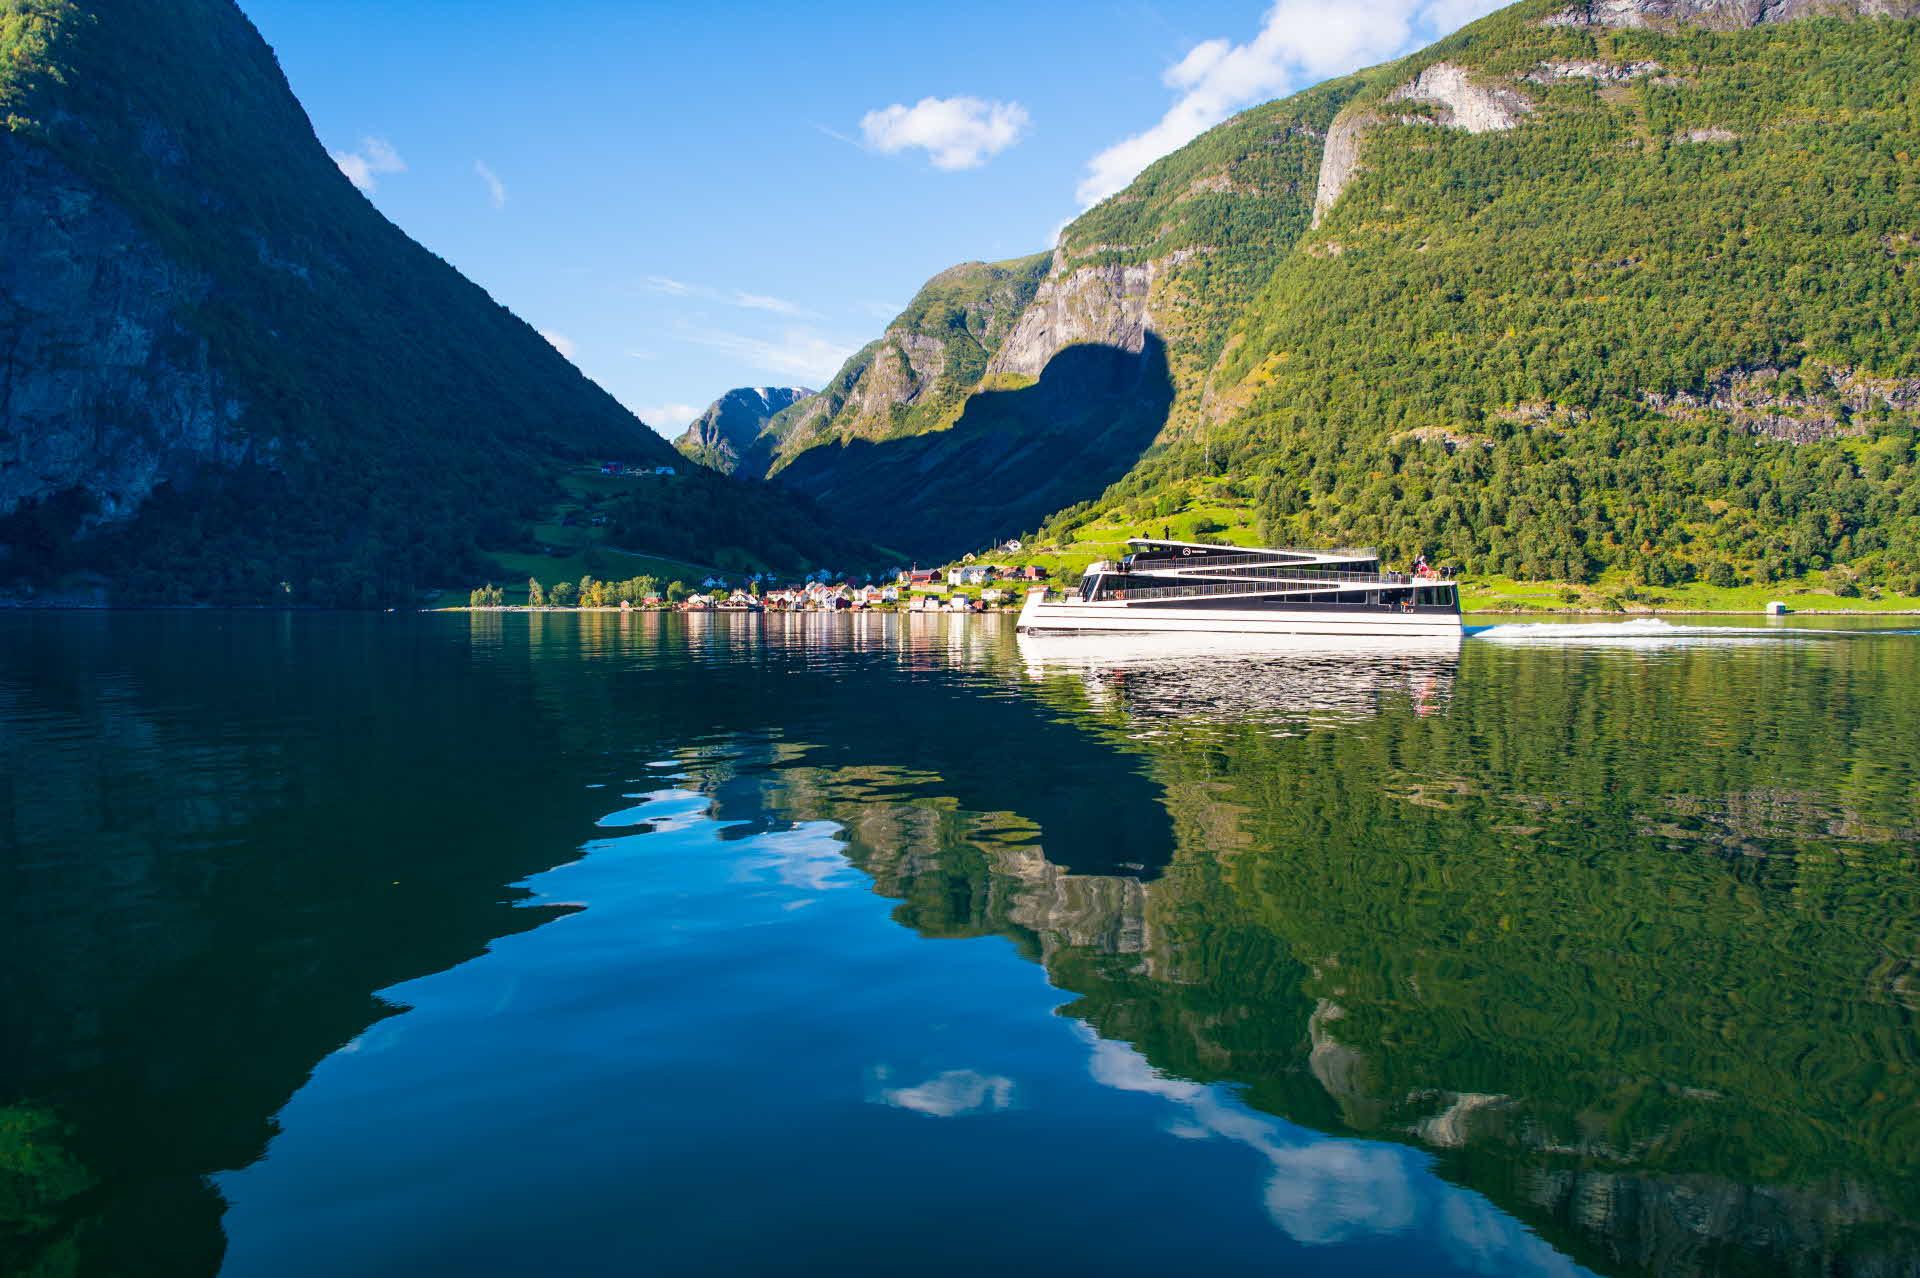 Elektrisk båt passerer Undredal i Aurlandsfjorden